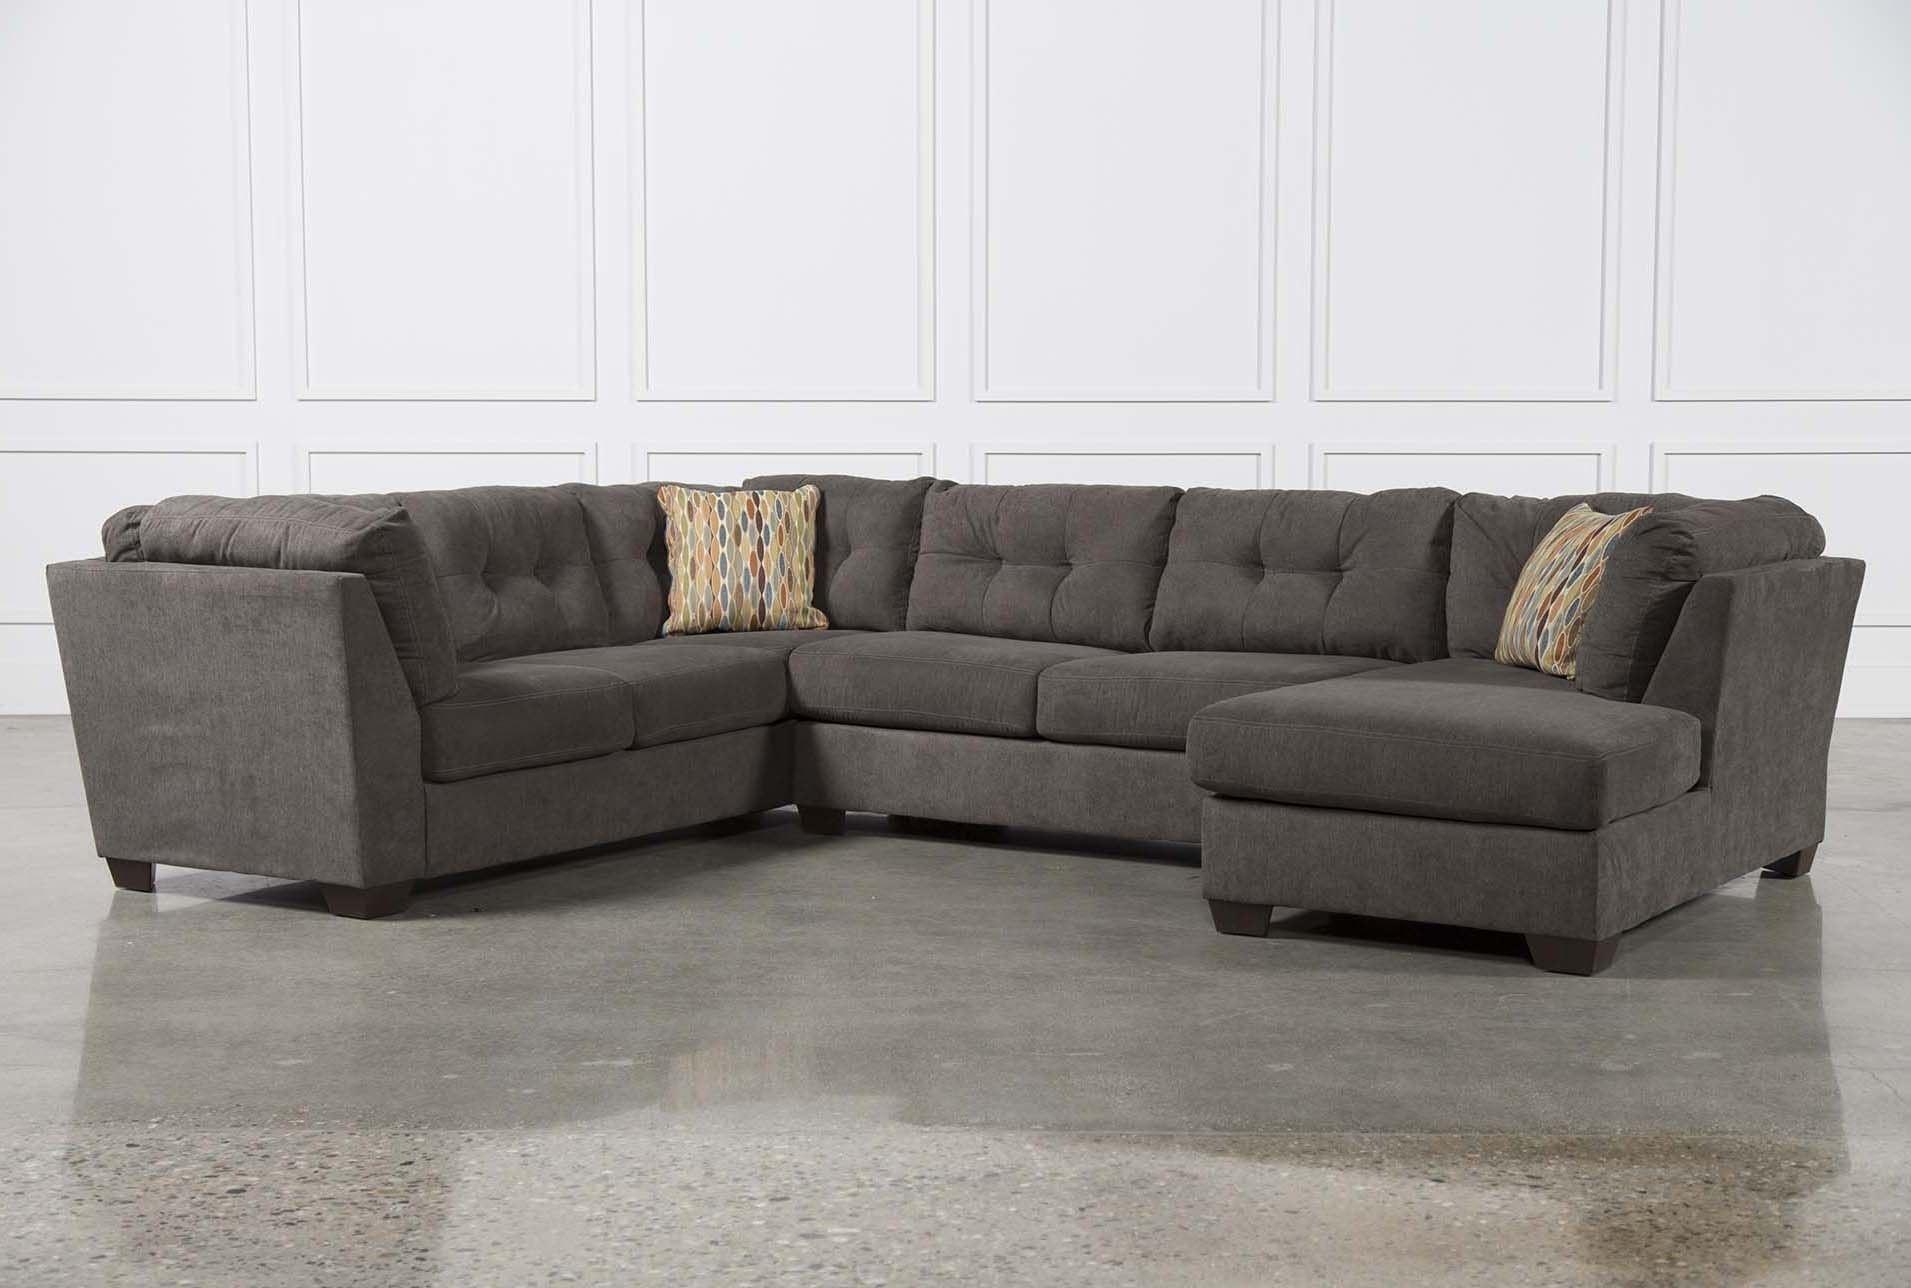 Popular Photo of 3 Piece Sectional Sleeper Sofas